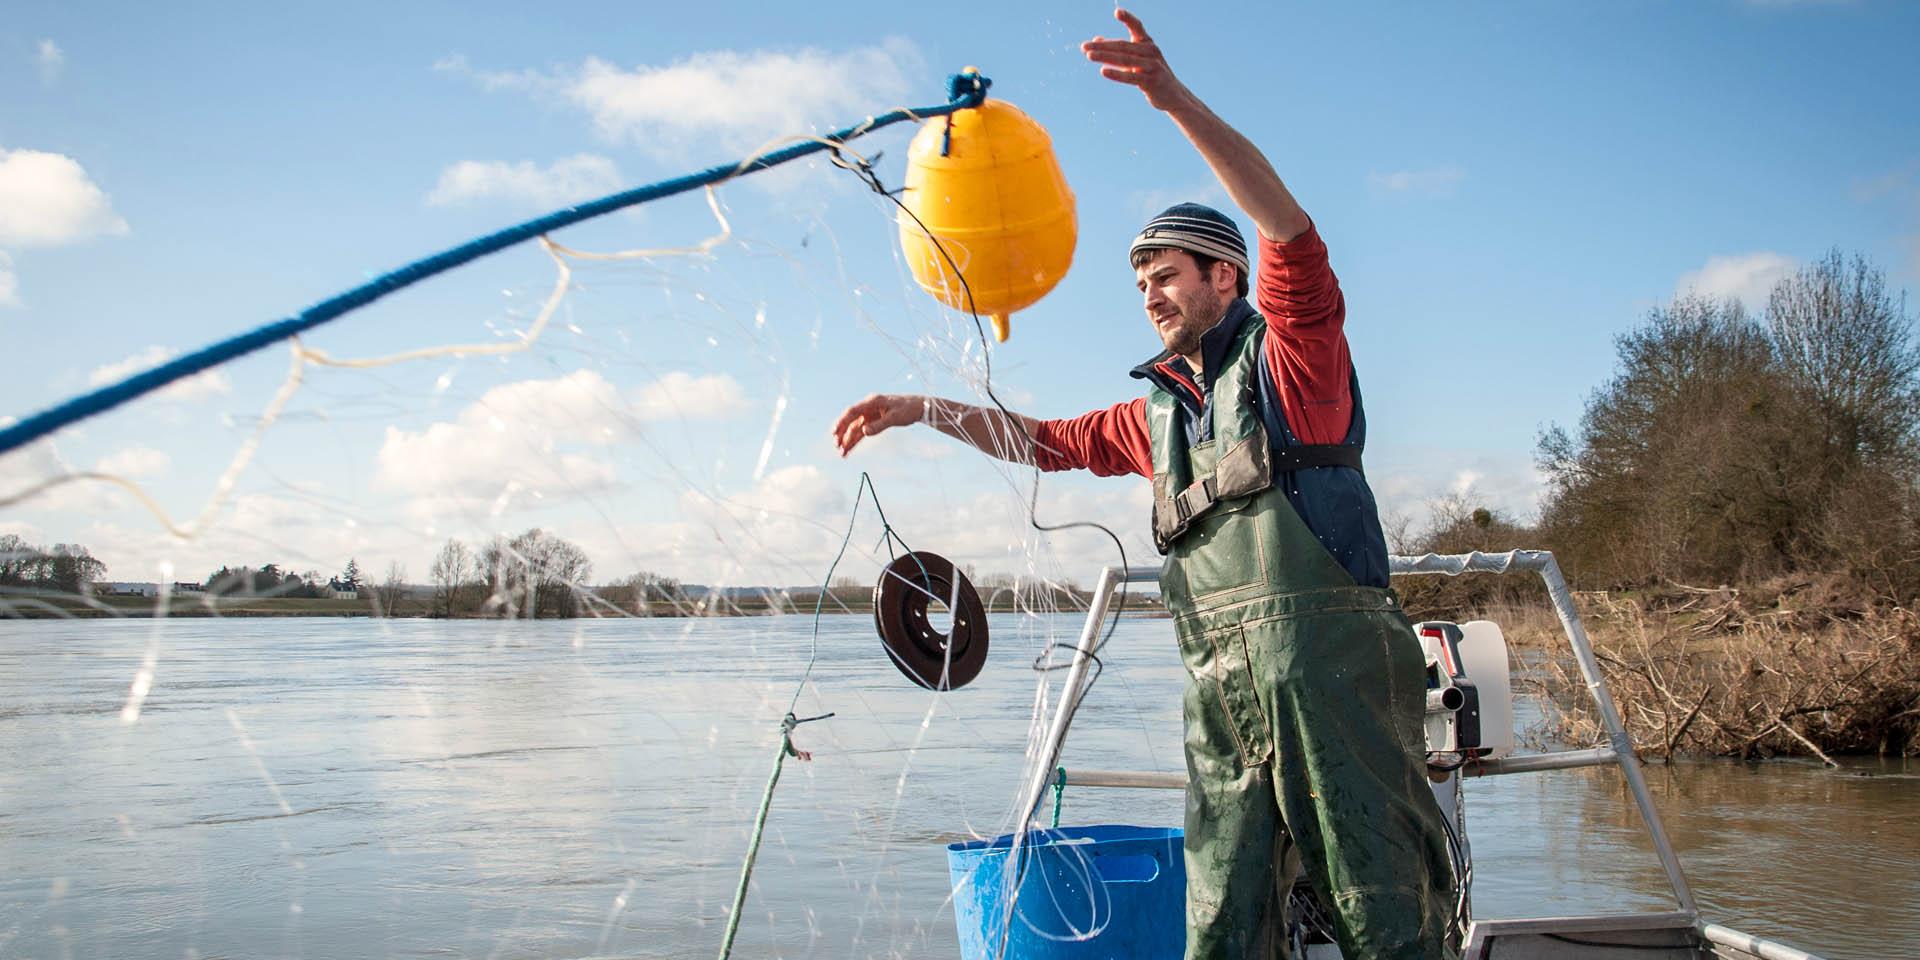 Romain Gadais, a fisherman on the Loire River